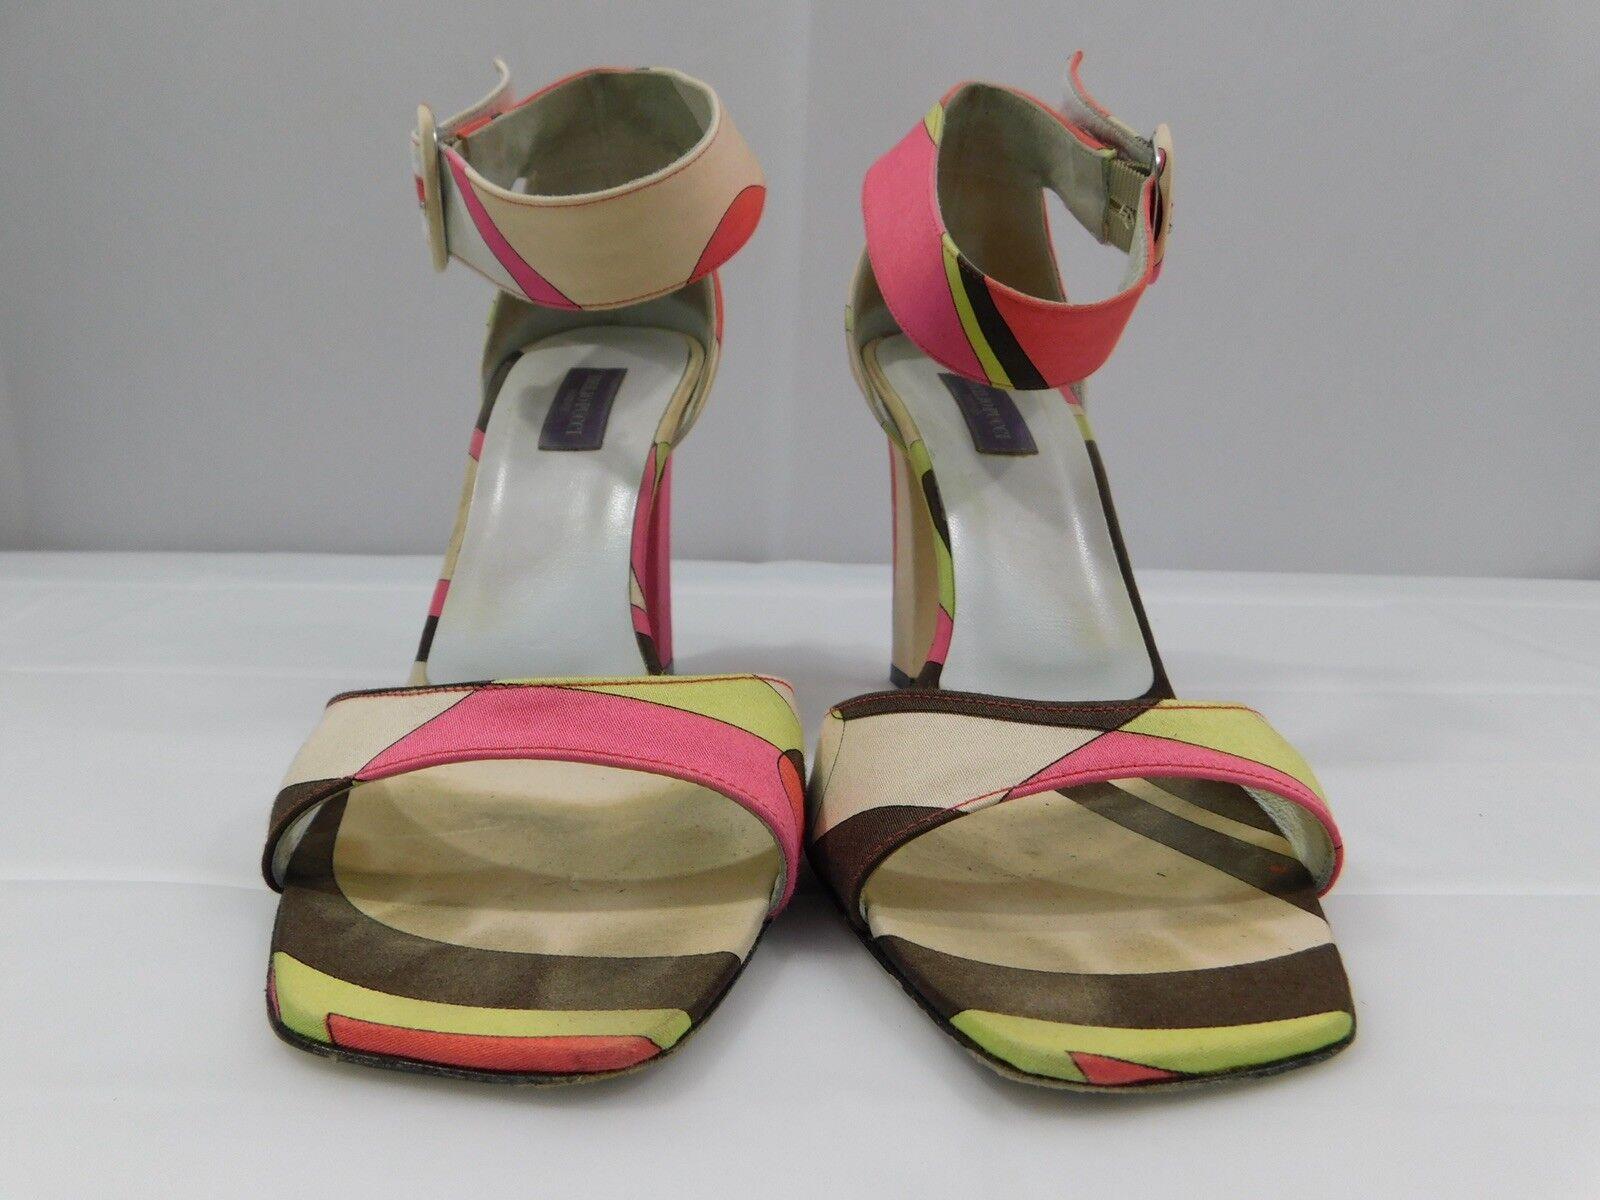 Emilio Pucci Firenze Signature Silk Print Heels Ankle Strap EUR 37.5  US 7.5